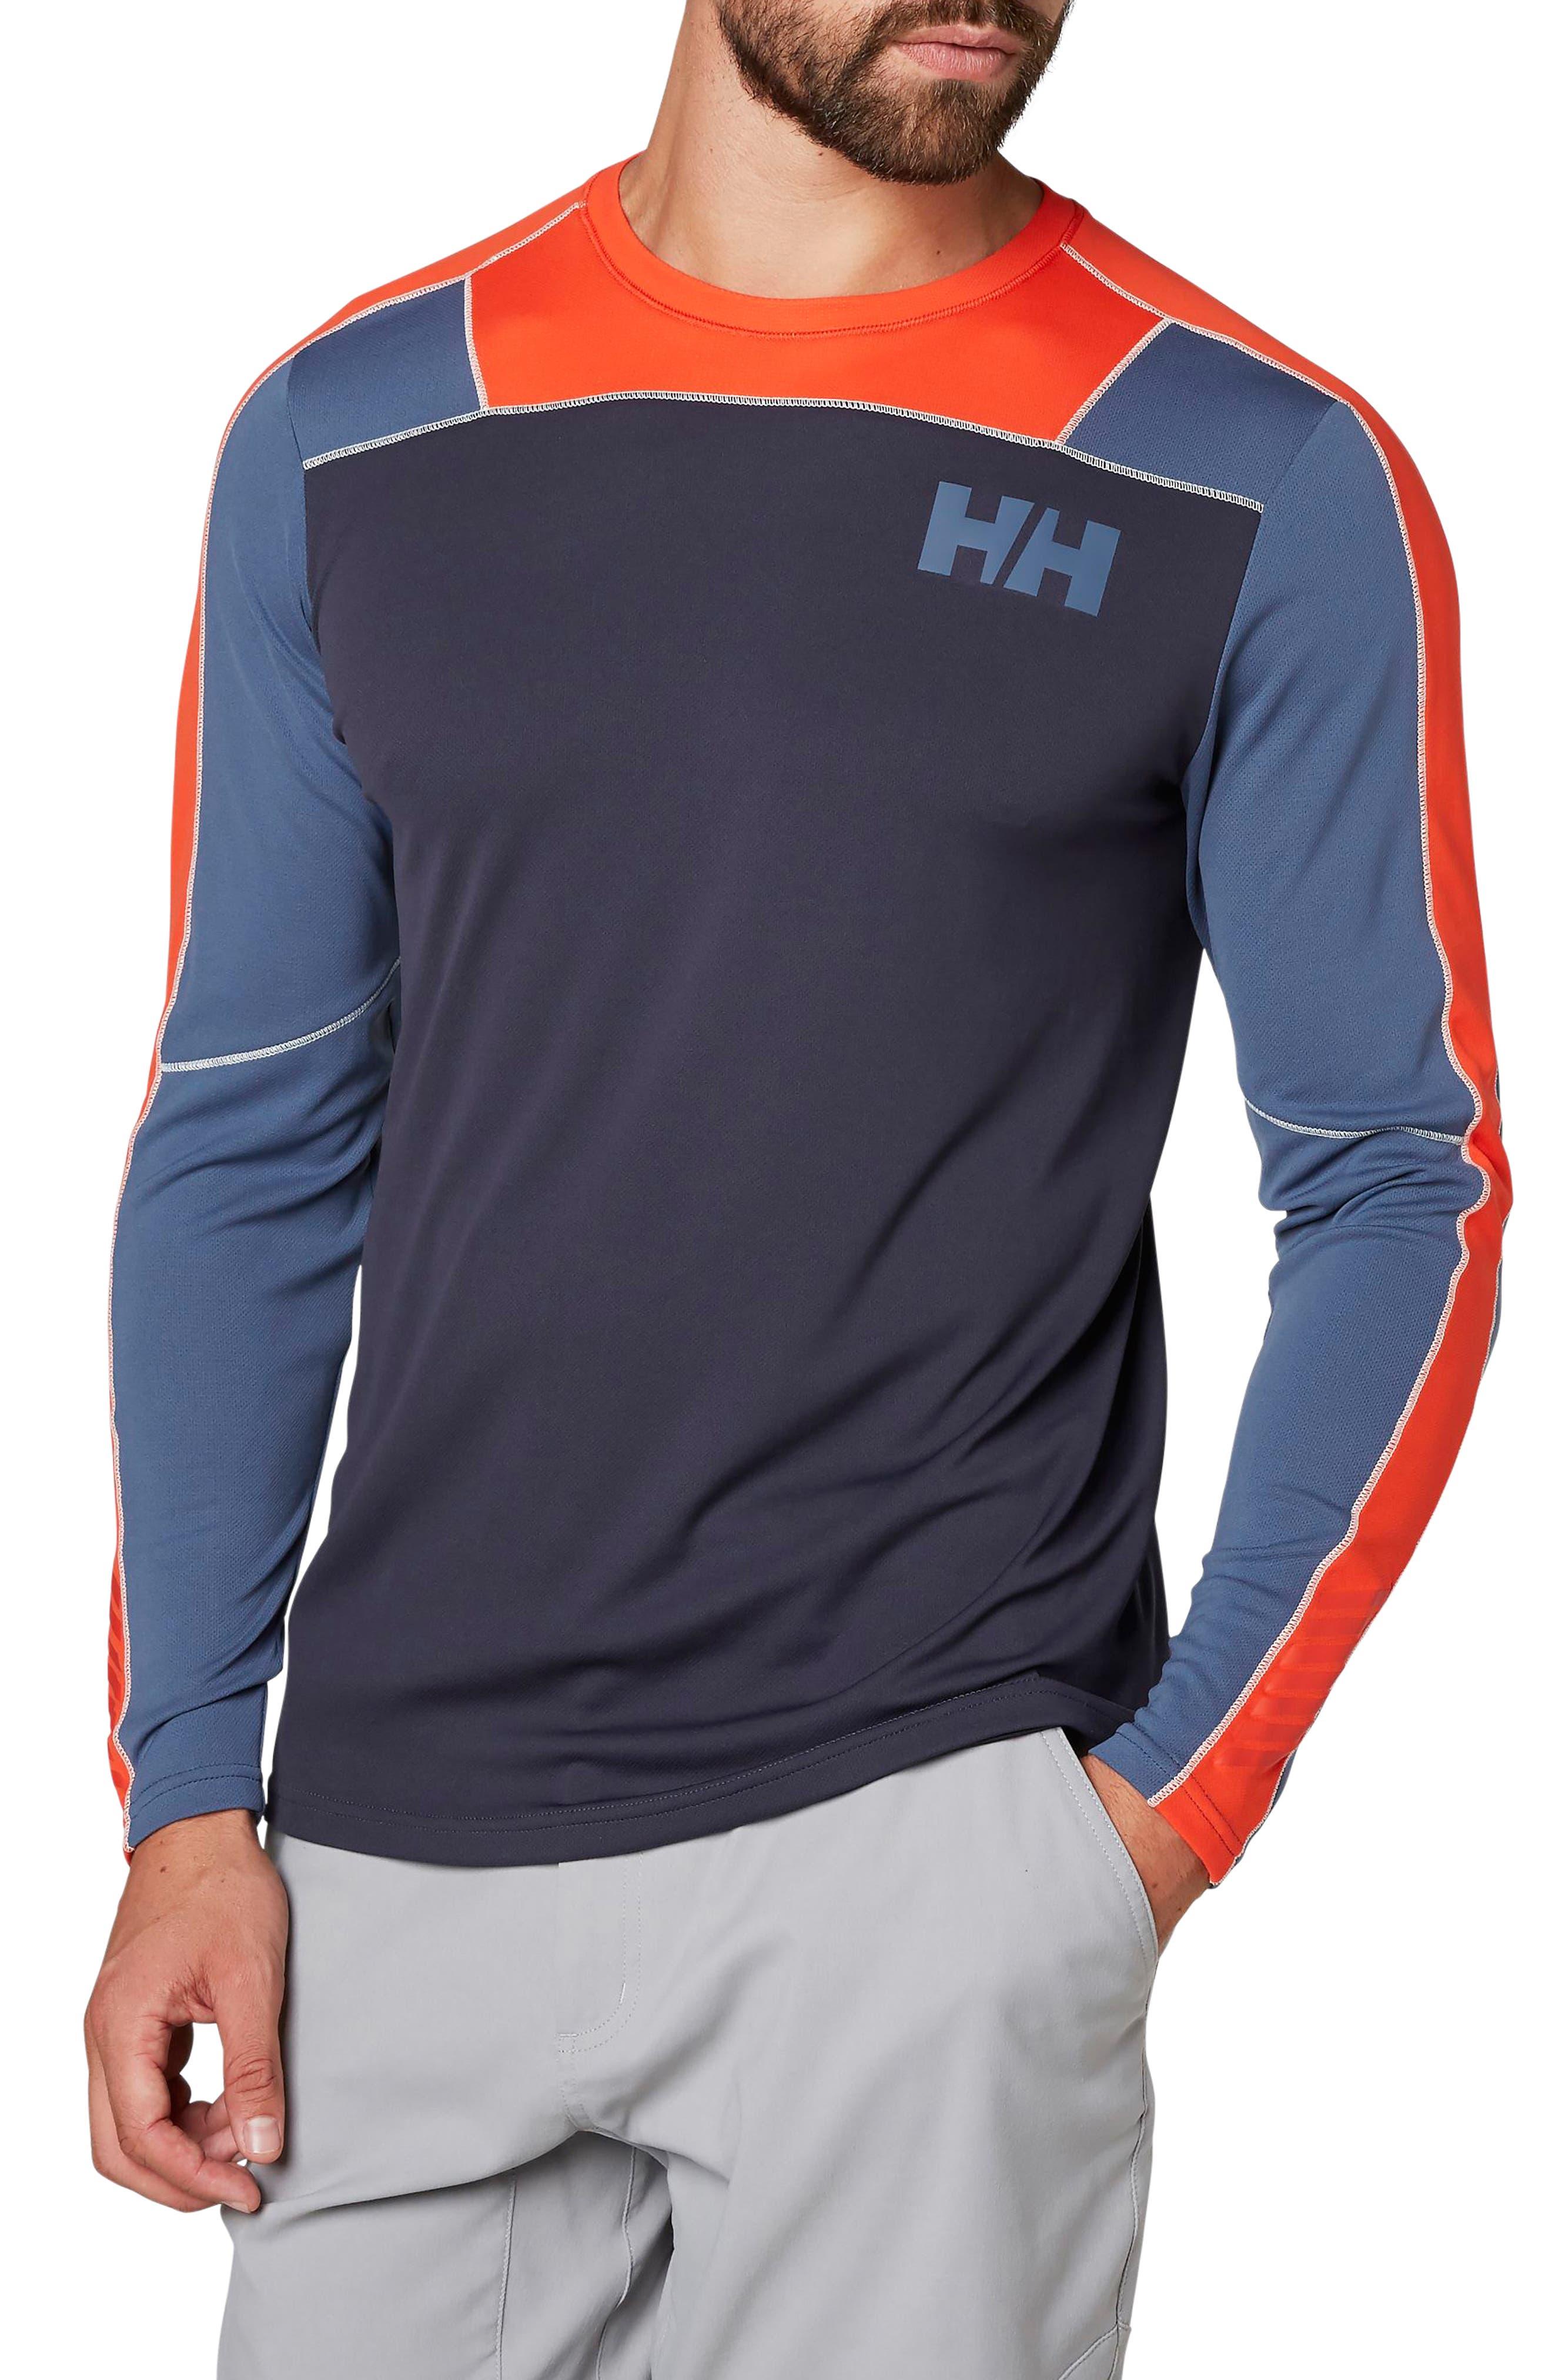 HH<sup>®</sup> Lifa Active Light Long Sleeve T-Shirt,                             Main thumbnail 1, color,                             Graphite Blue